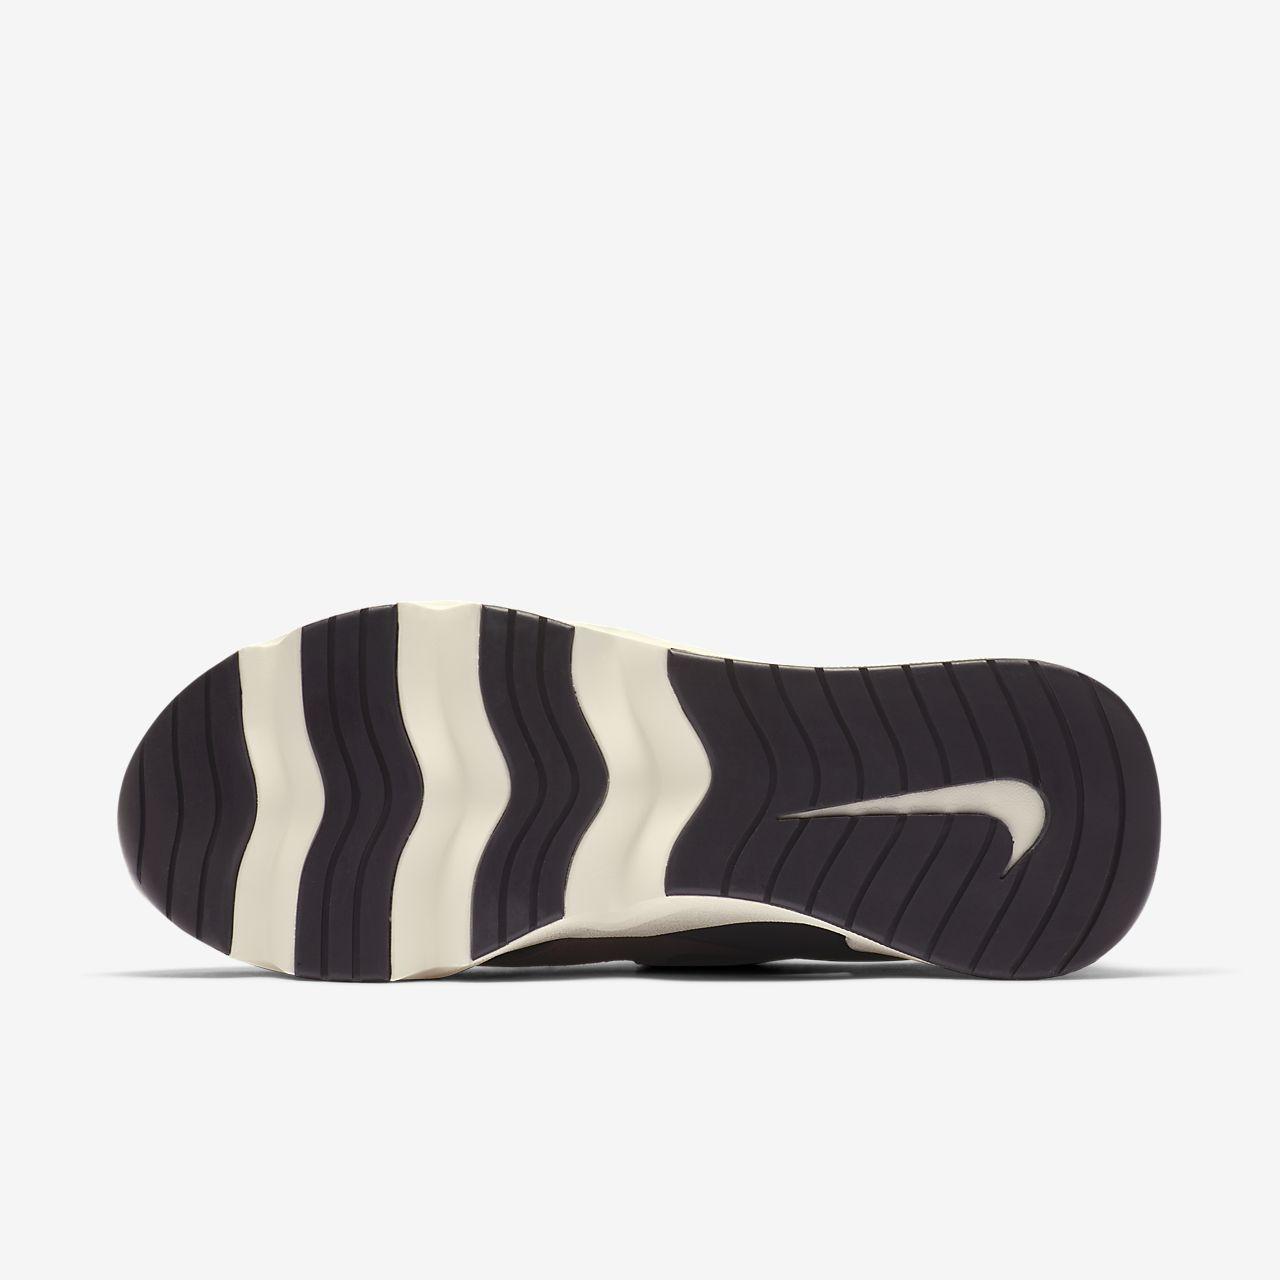 Nike Femme Chaussure 365 Pour Ryz wmN0PyvO8n